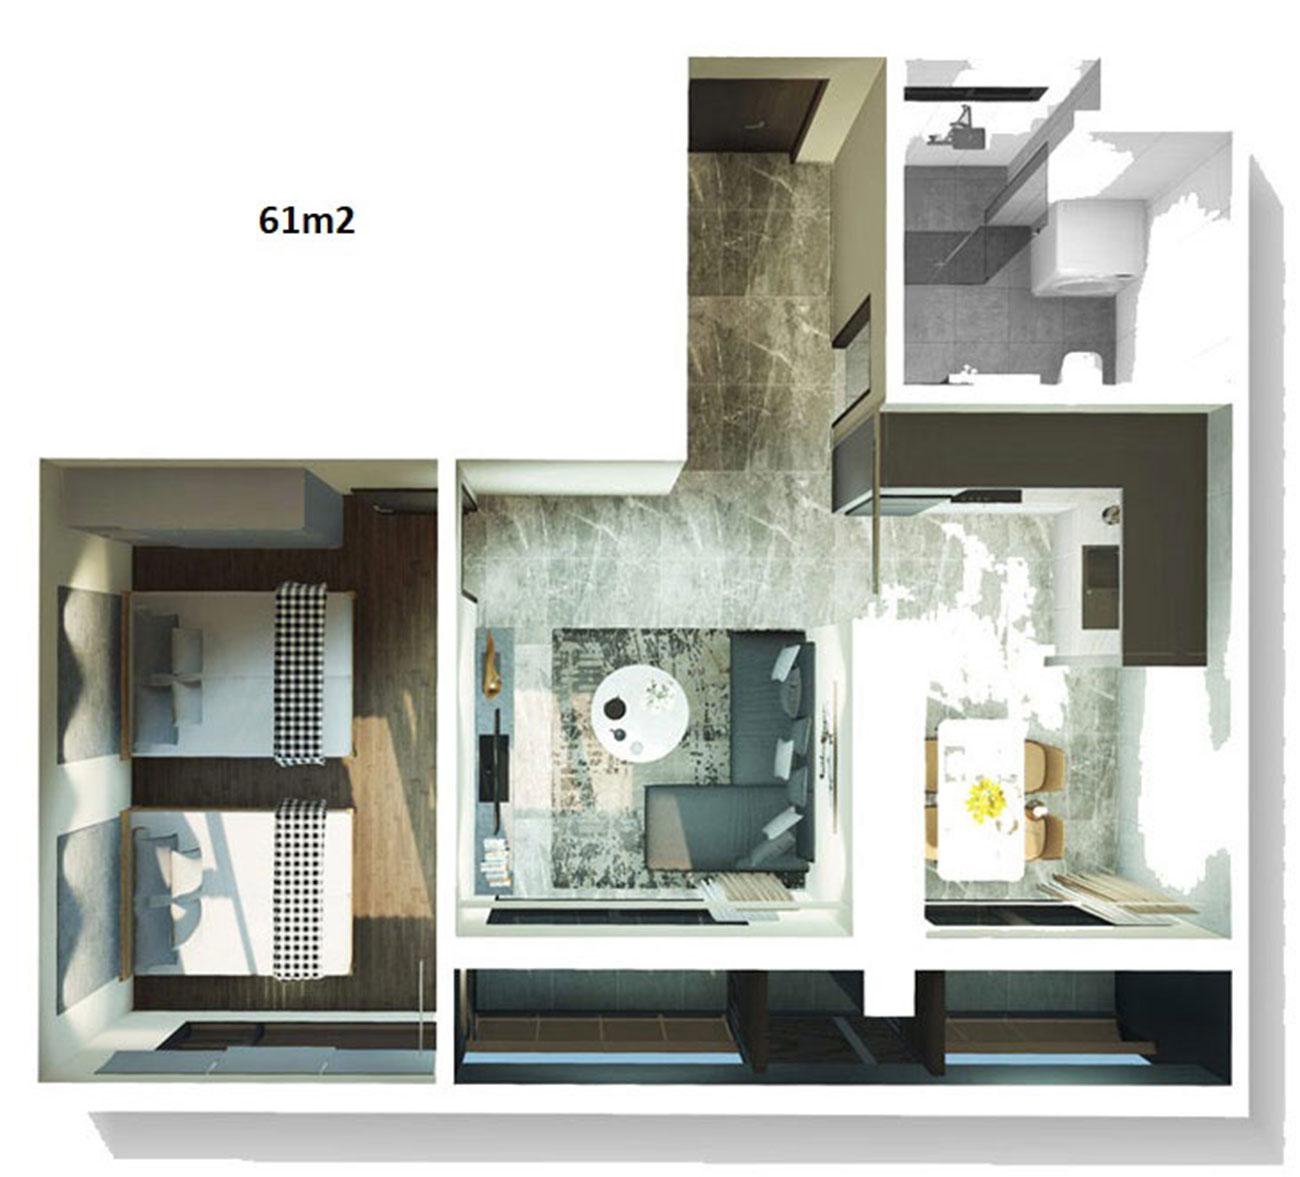 Thiết kế chi tiết căn hộ Kingdom 101 diện tích 61 m2